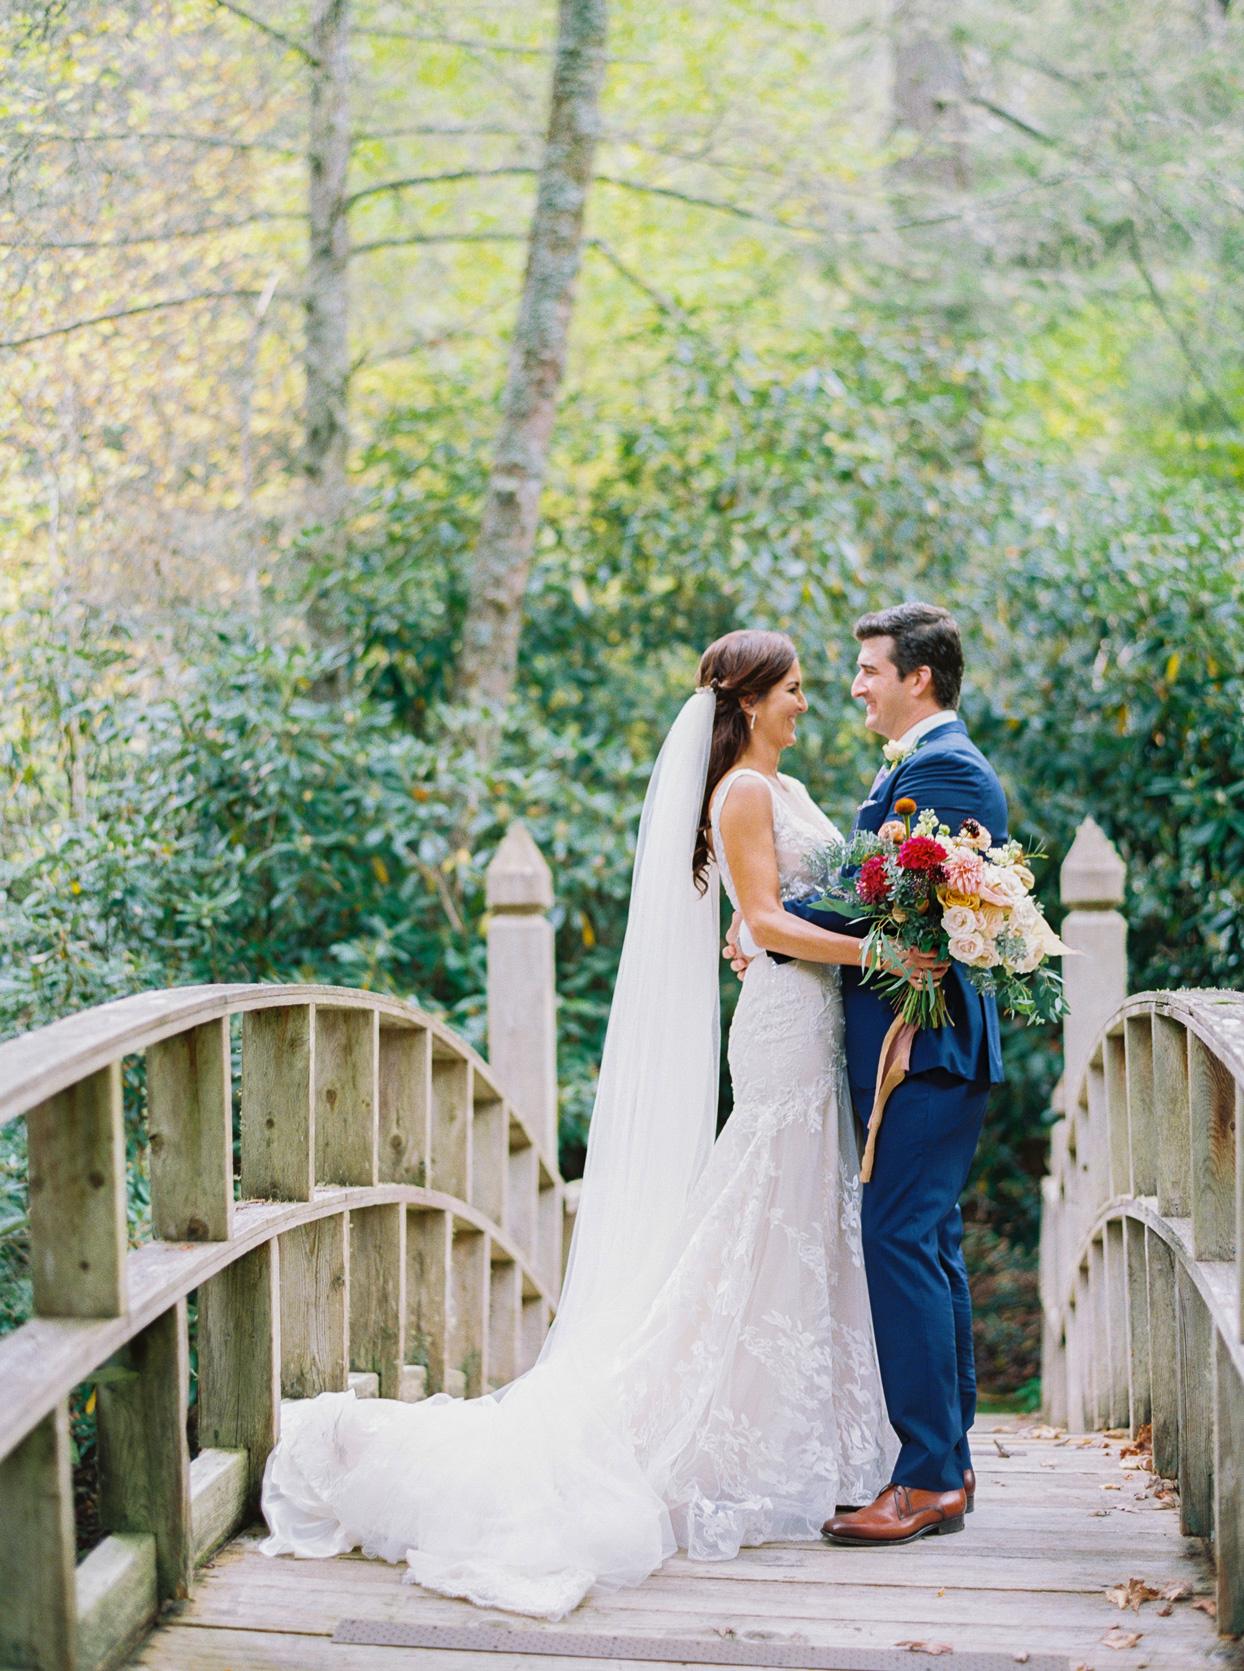 Bride and groom standing together on bridge